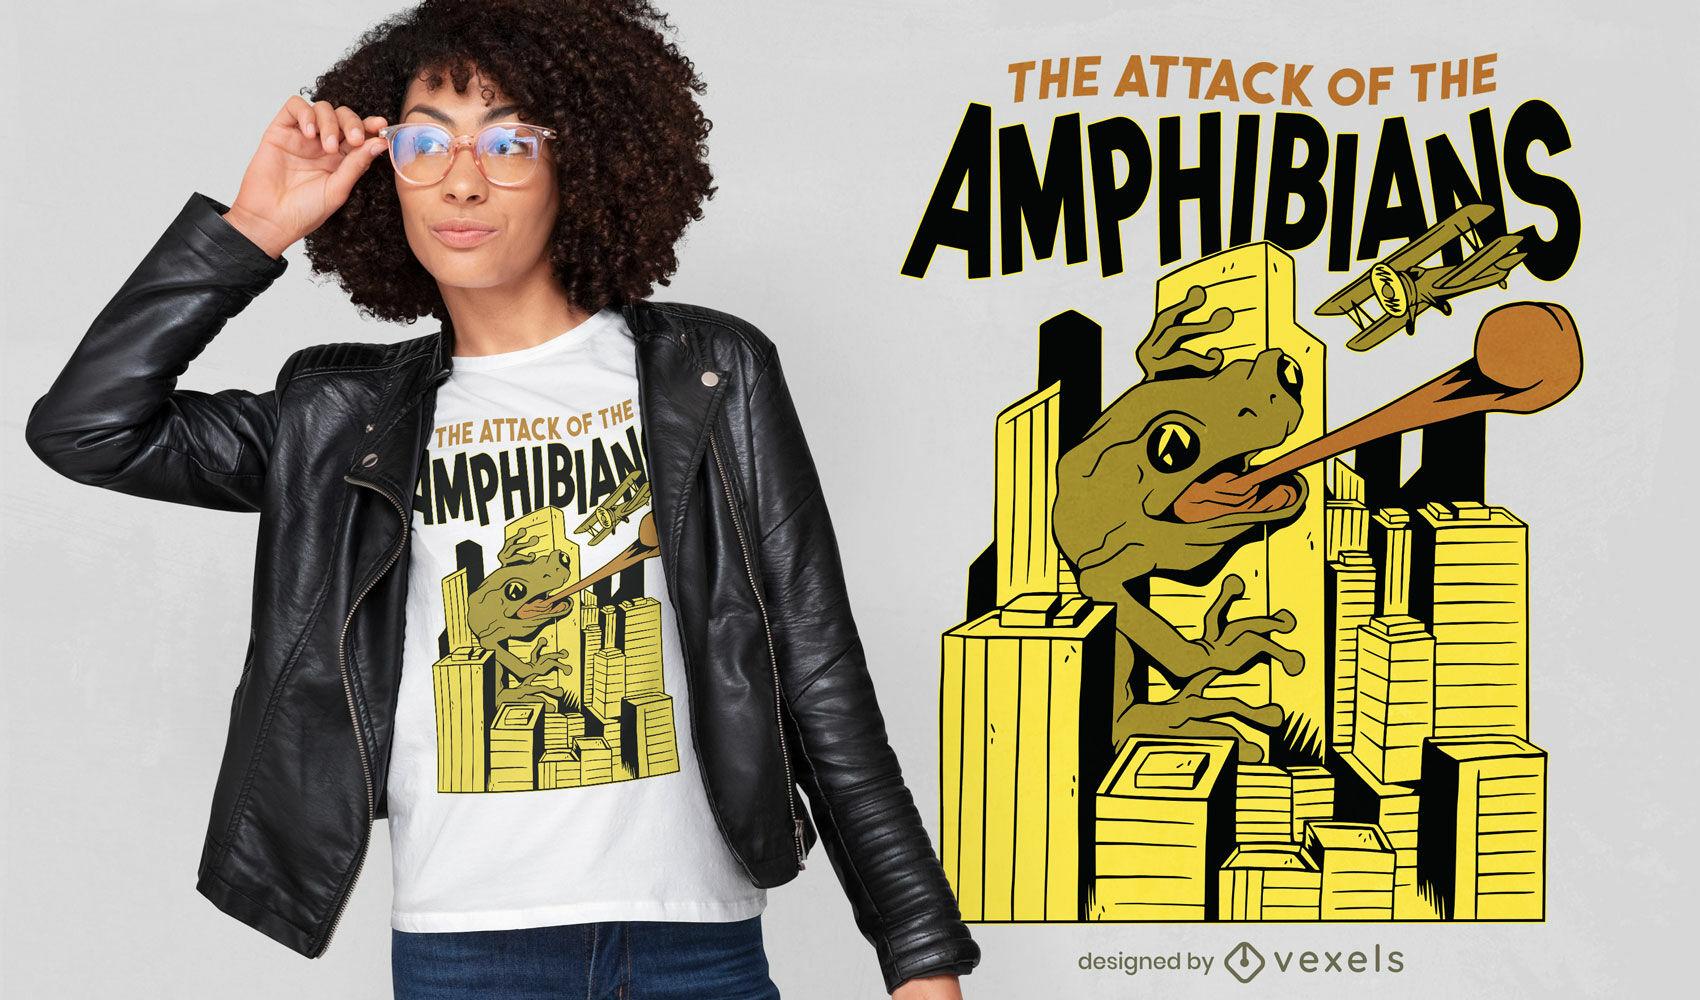 Attack of the amphibians t-shirt design